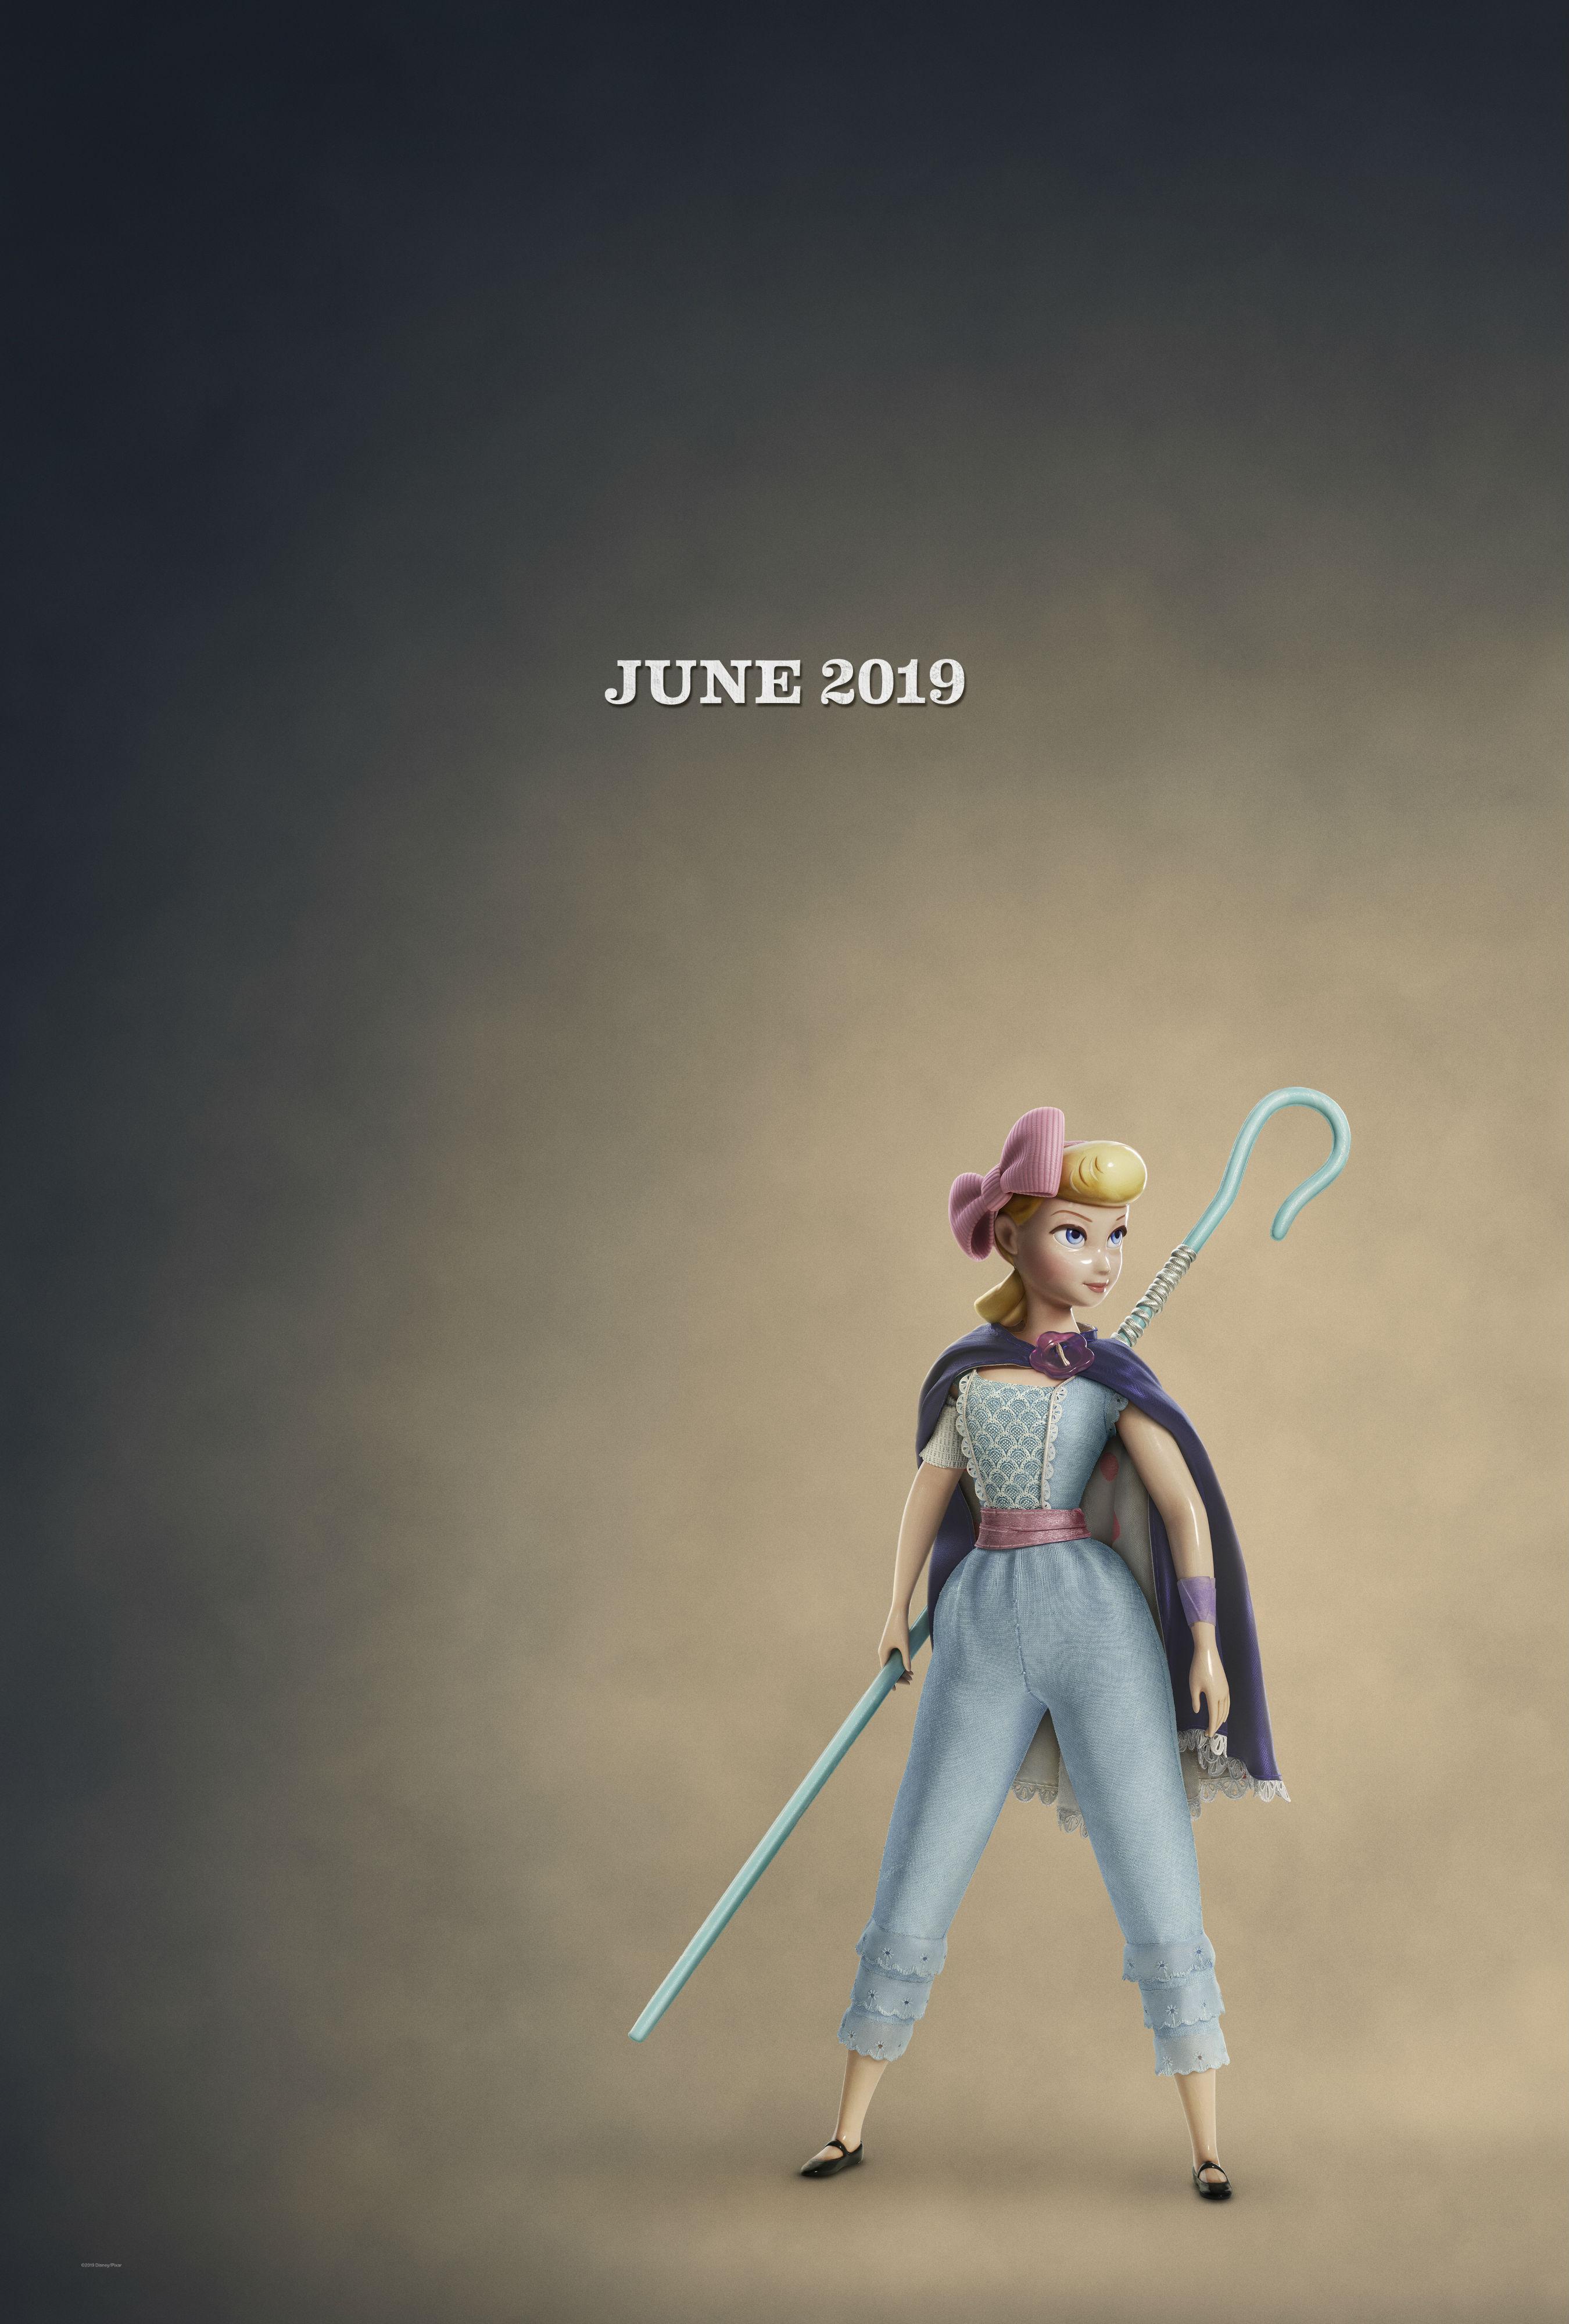 toy-story-4-bo-peep-poster